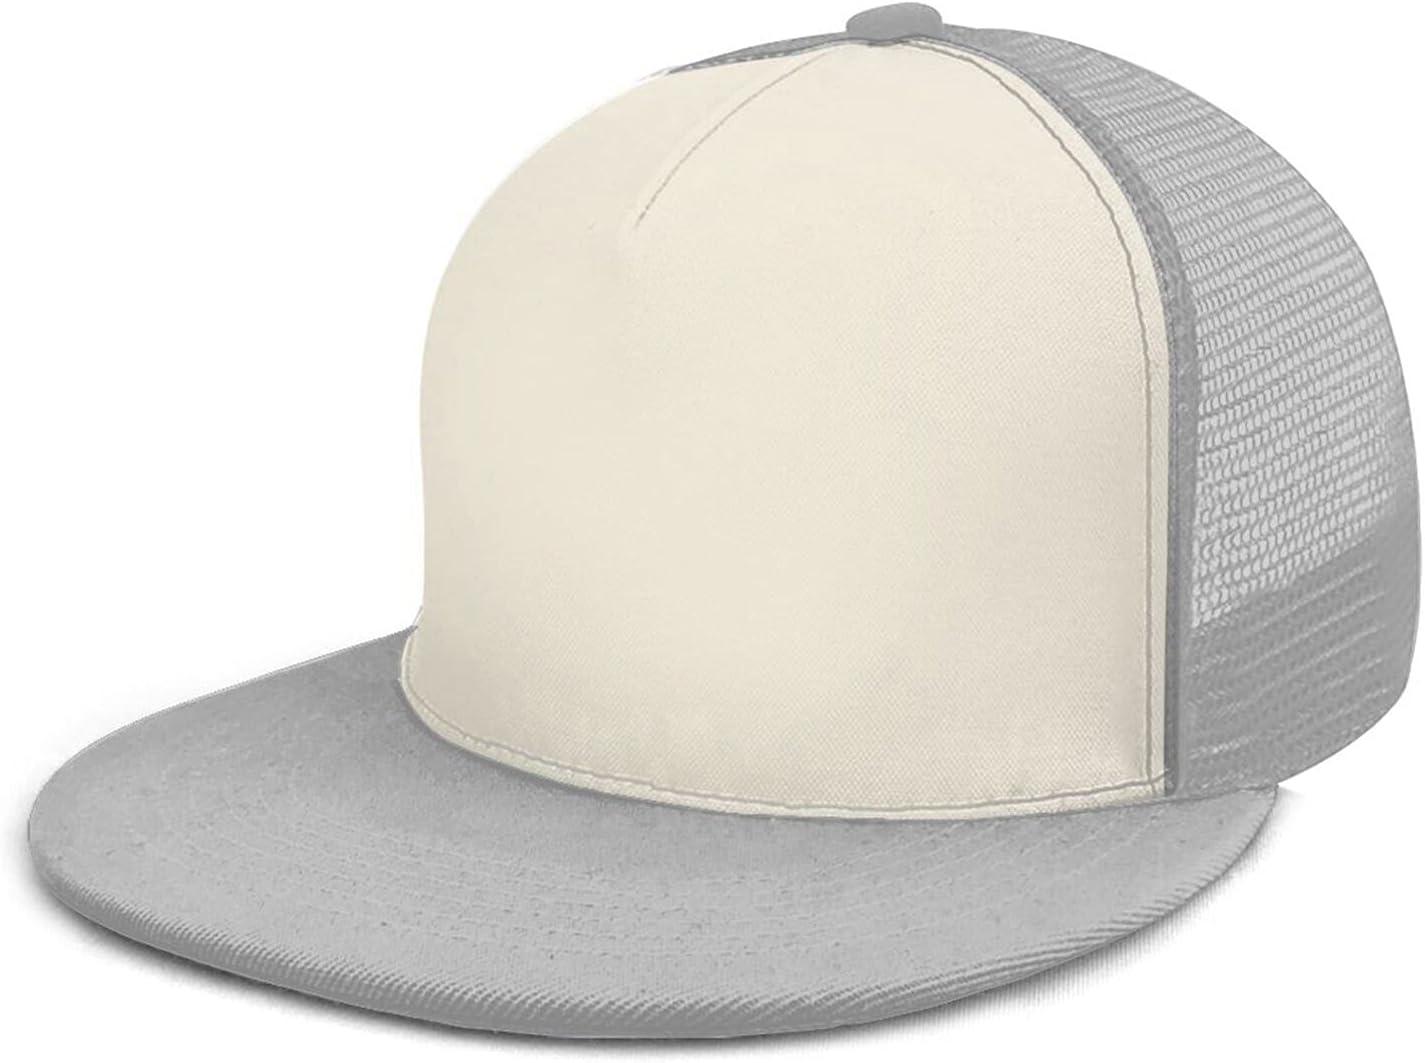 WLYJXB Grey Beige Black Gray Navy Col Army Hat Plain Cap Financial sales sale Be super welcome Fashion